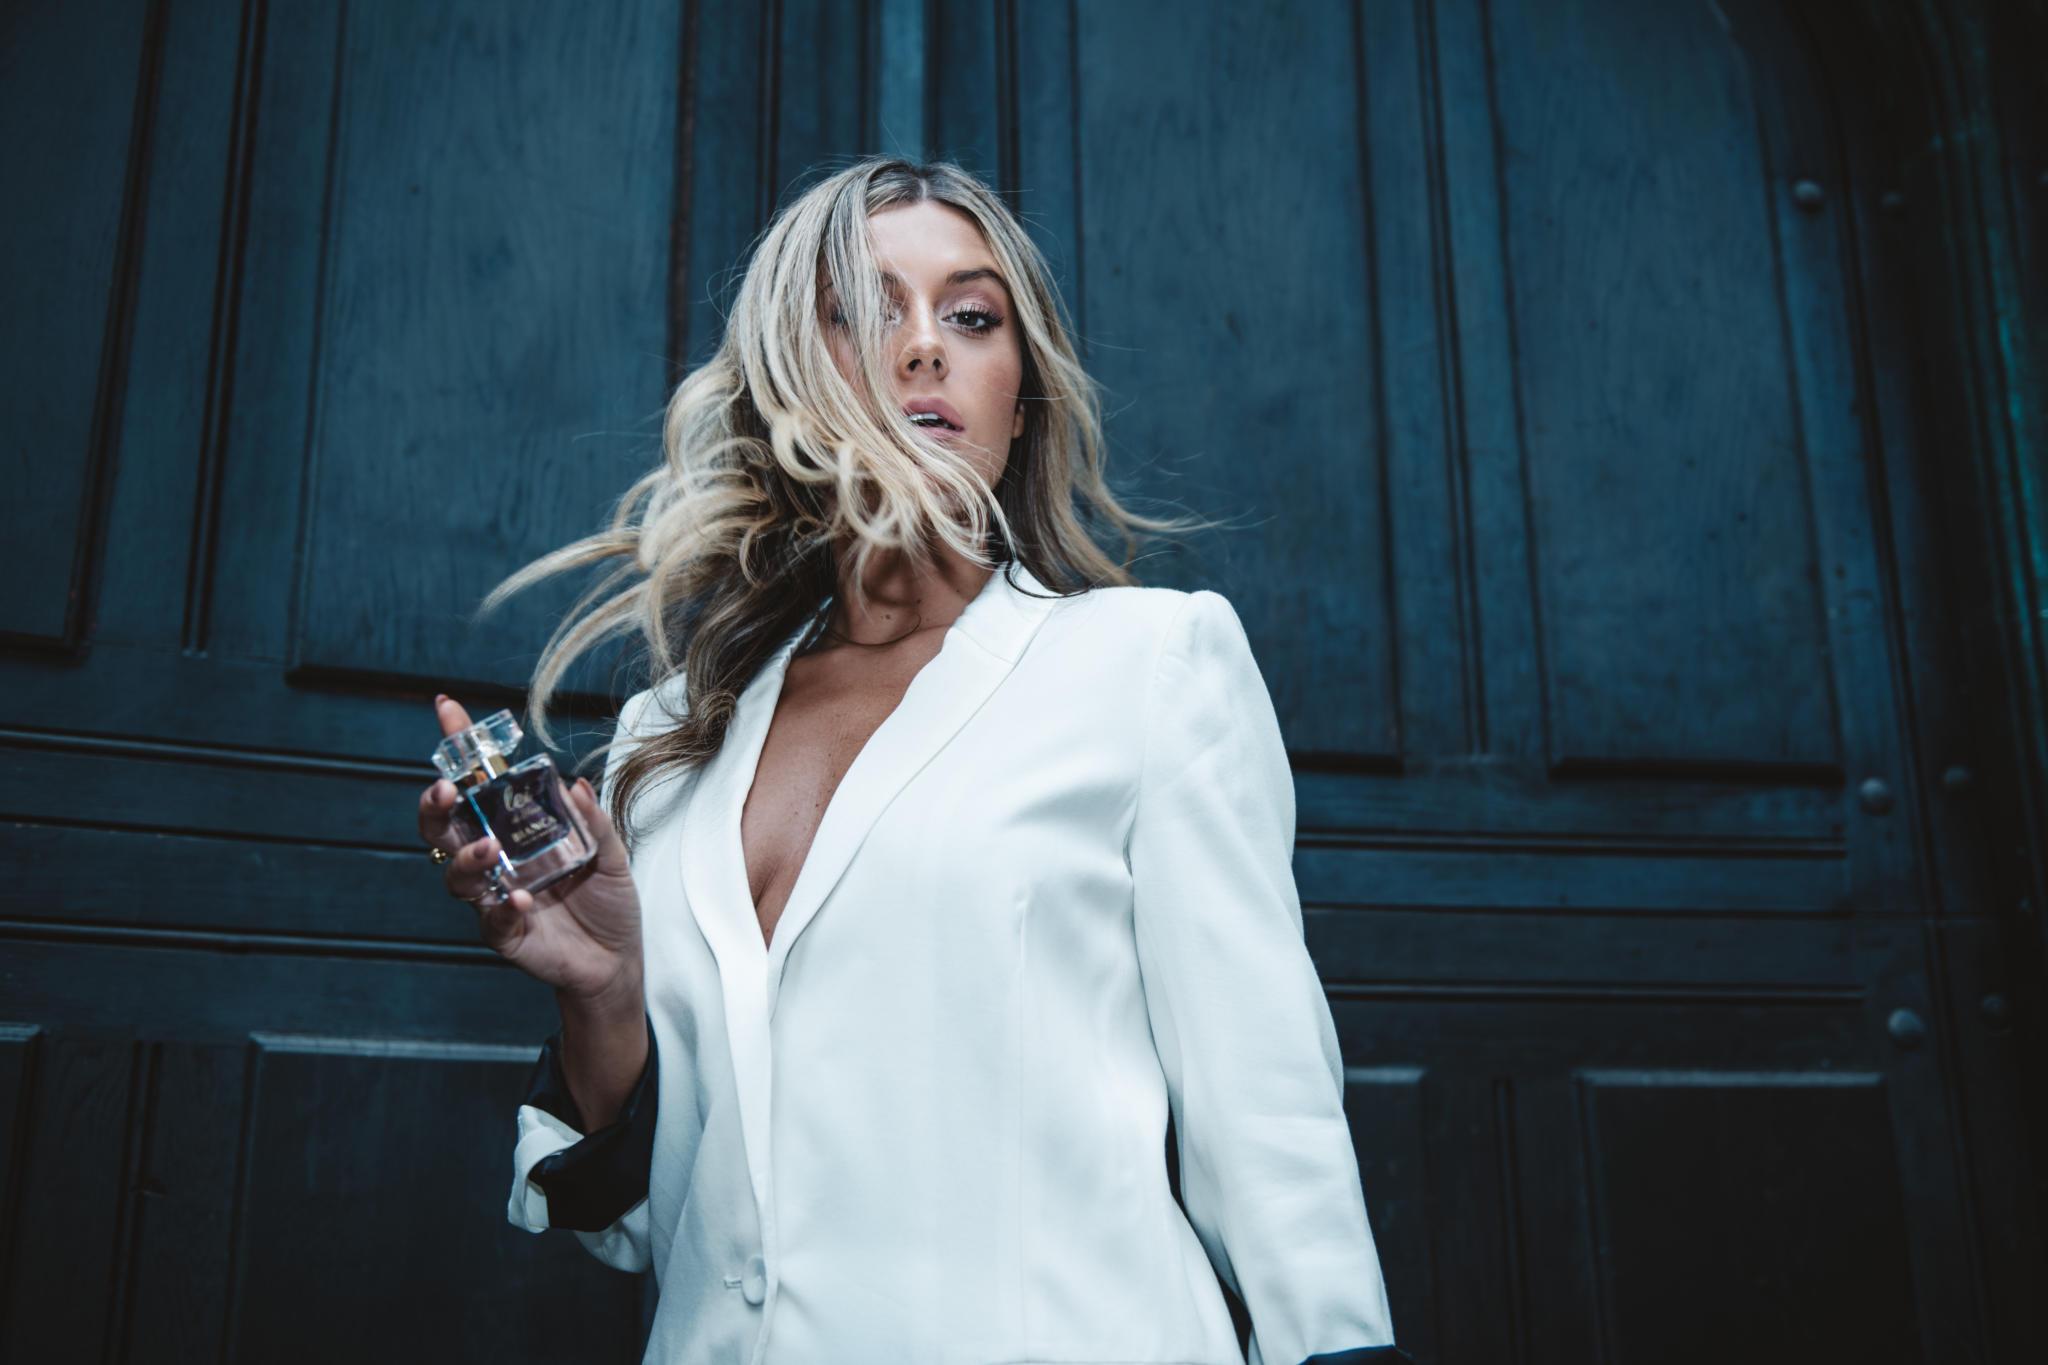 Bianca Ingrosso » LÅT MIG PRESENTERA MIN NYA PARFYM LEI DI SERA